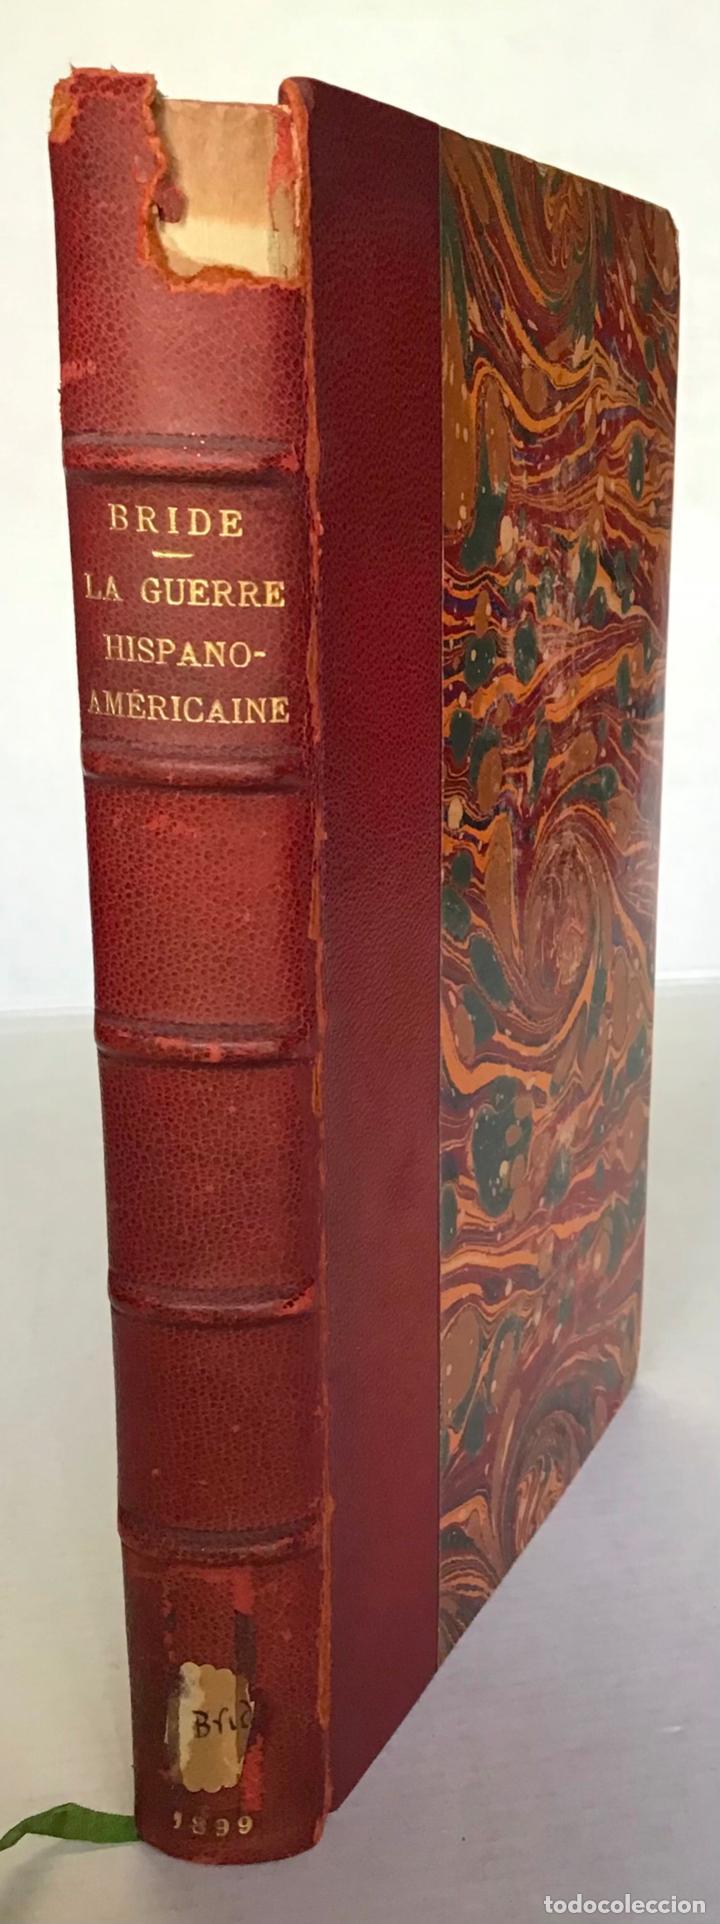 Libros antiguos: LA GUERRE HISPANO-AMÉRICAINE DE 1898. - CH. BRIDE, Capitaine. - Foto 2 - 286635208